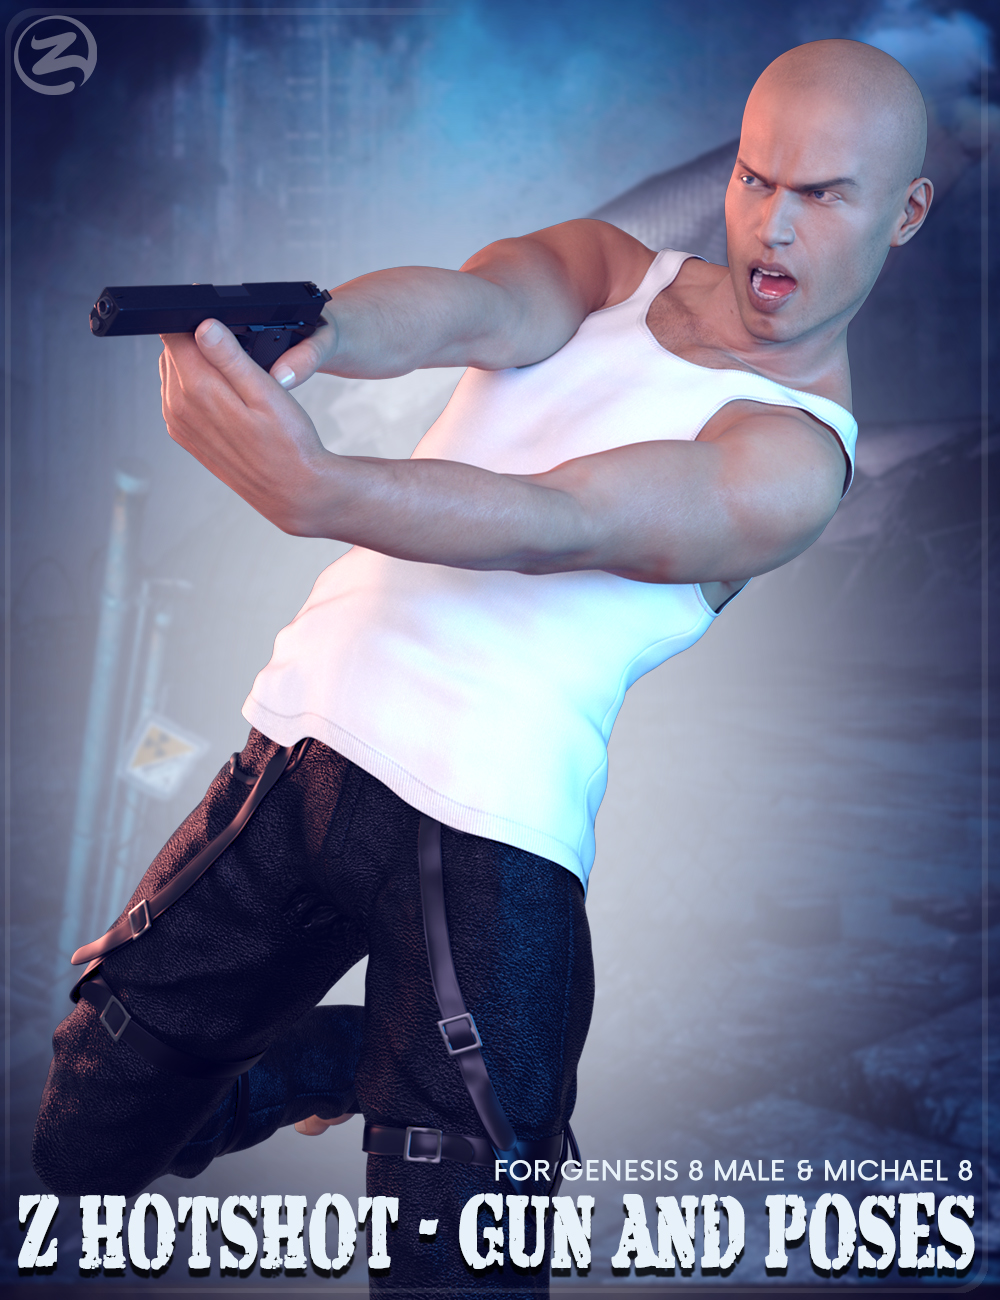 Z Hotshot - Gun and Poses for Genesis 8 Male & Michael 8 by: Zeddicuss, 3D Models by Daz 3D